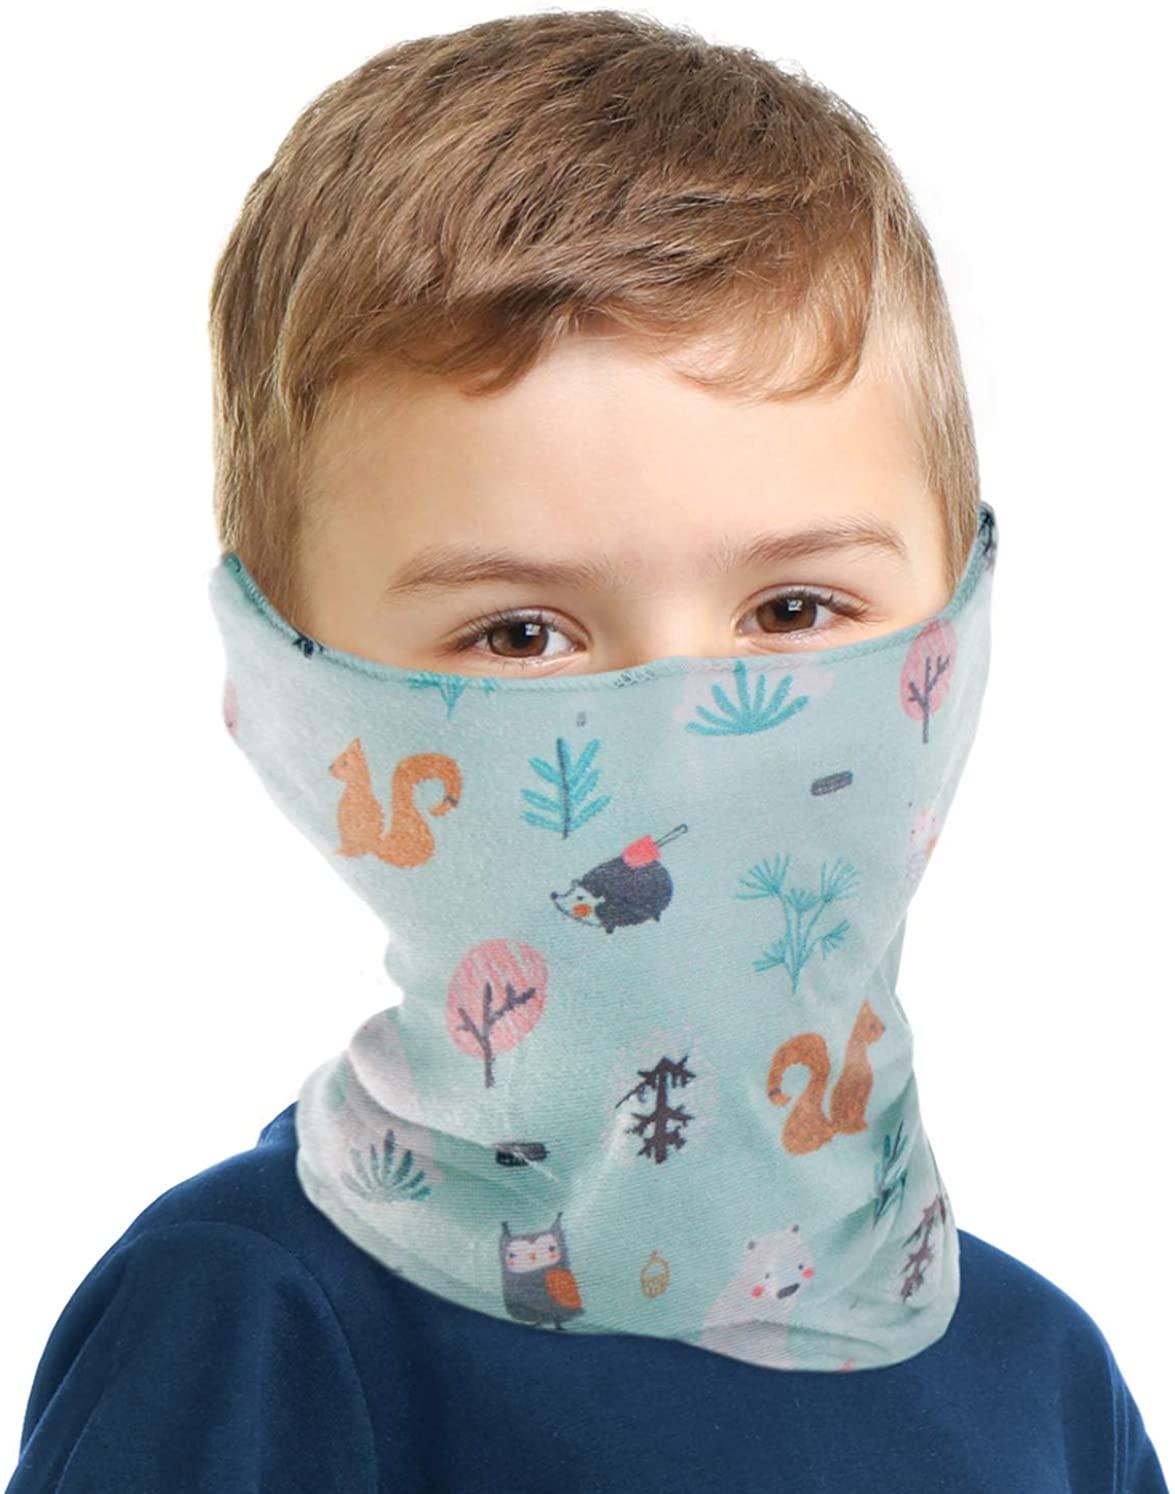 Kids Neck Gaiter Bandana Face Mask - Childs Full Face Cover & Tube Scarf Covering - UPF 30 Balaclava for UV, Dust Protection